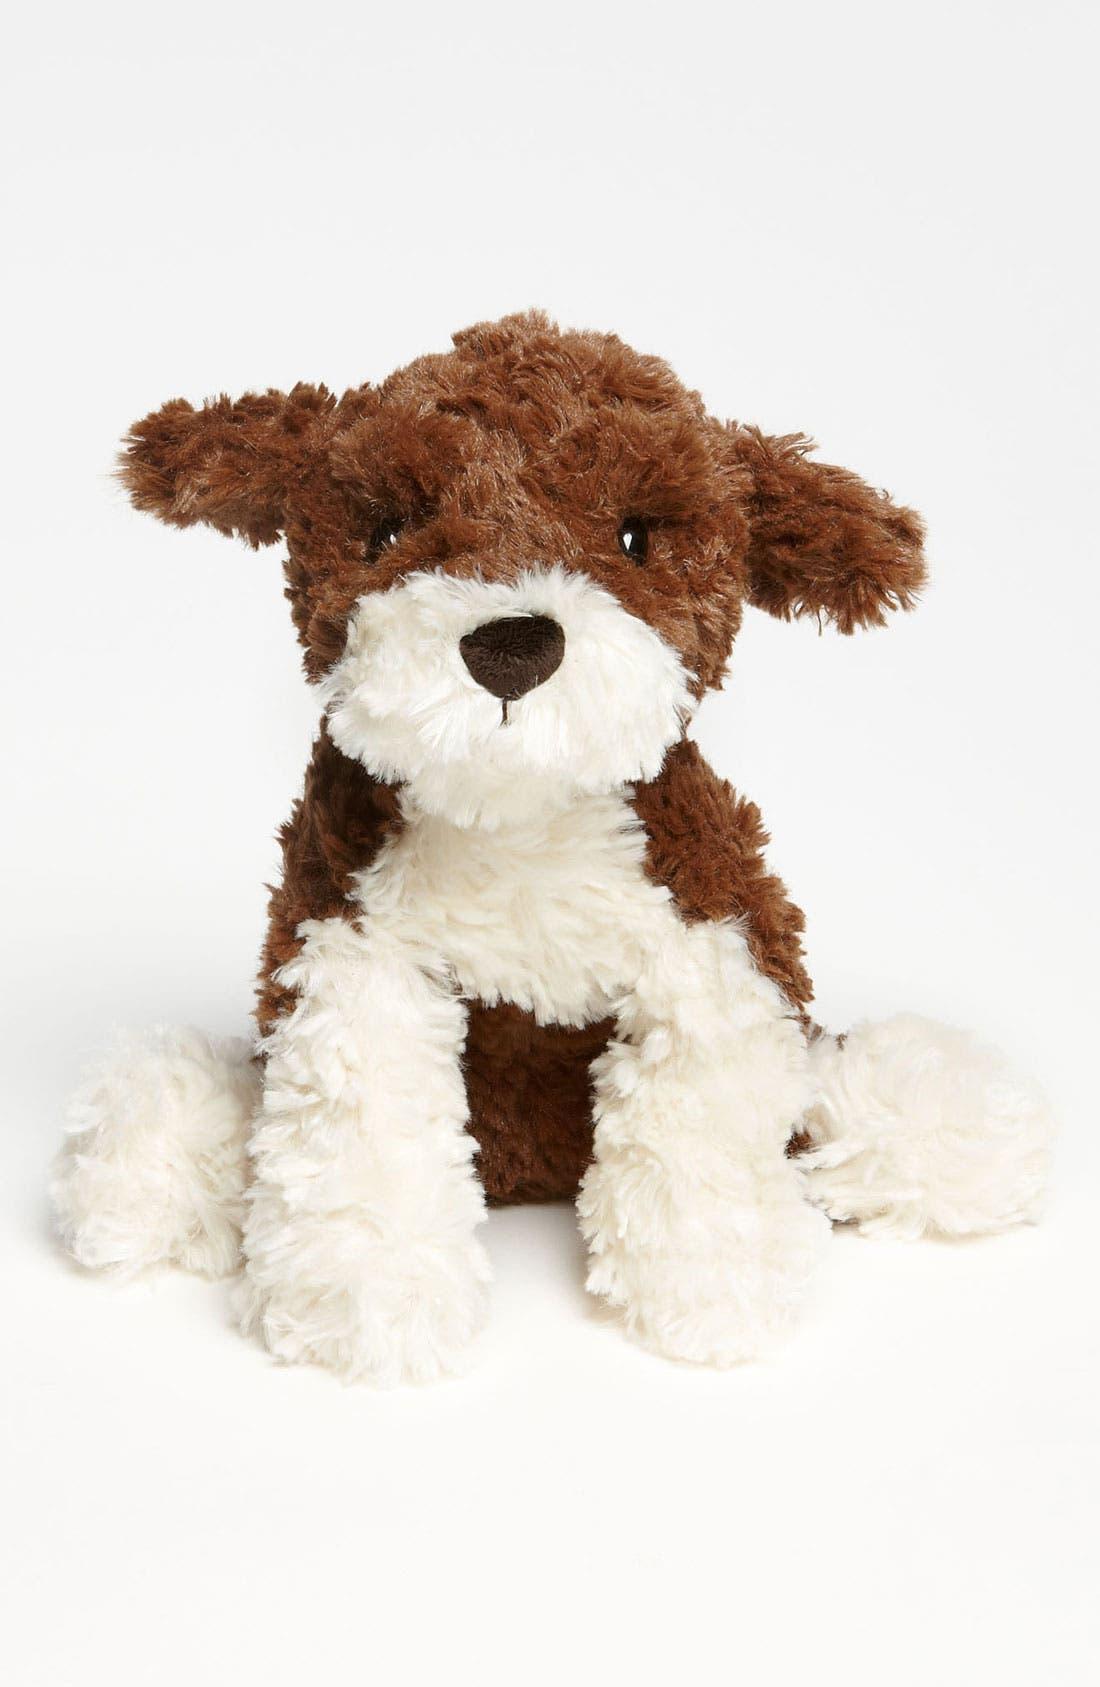 Alternate Image 1 Selected - Gund 'Mischa' Yorkie Stuffed Animal